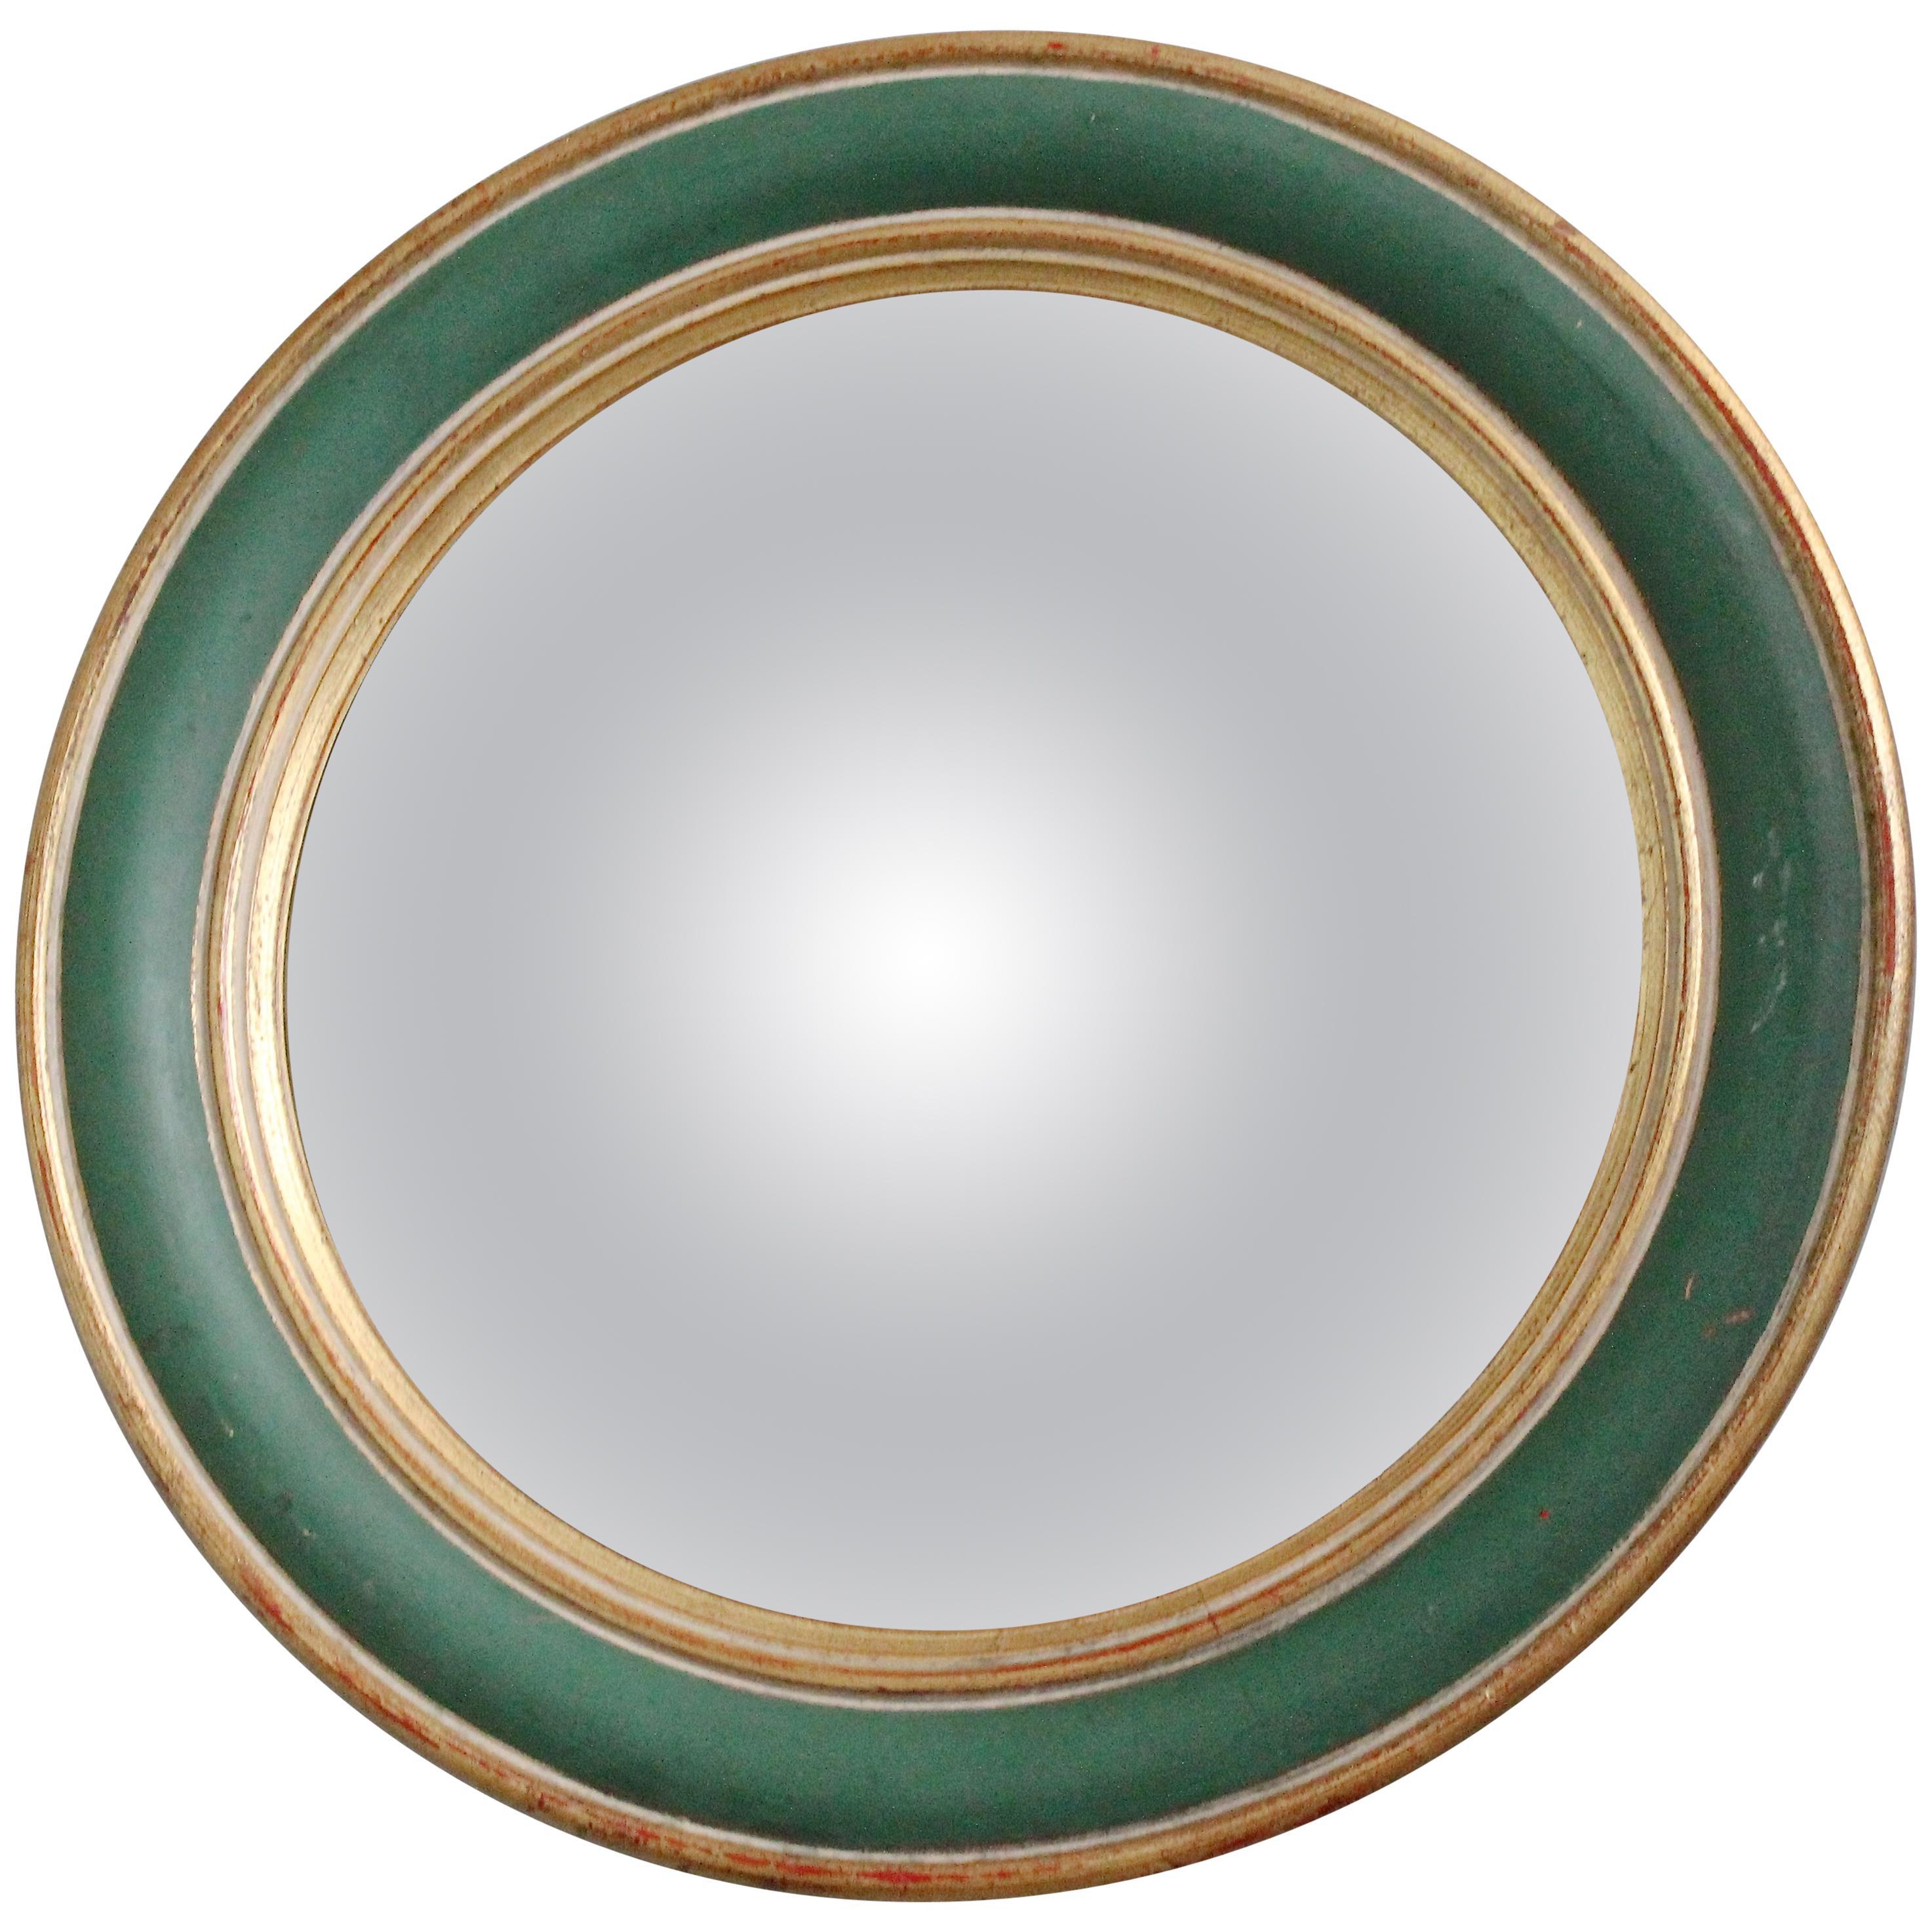 1930s French Bullseye Mirror